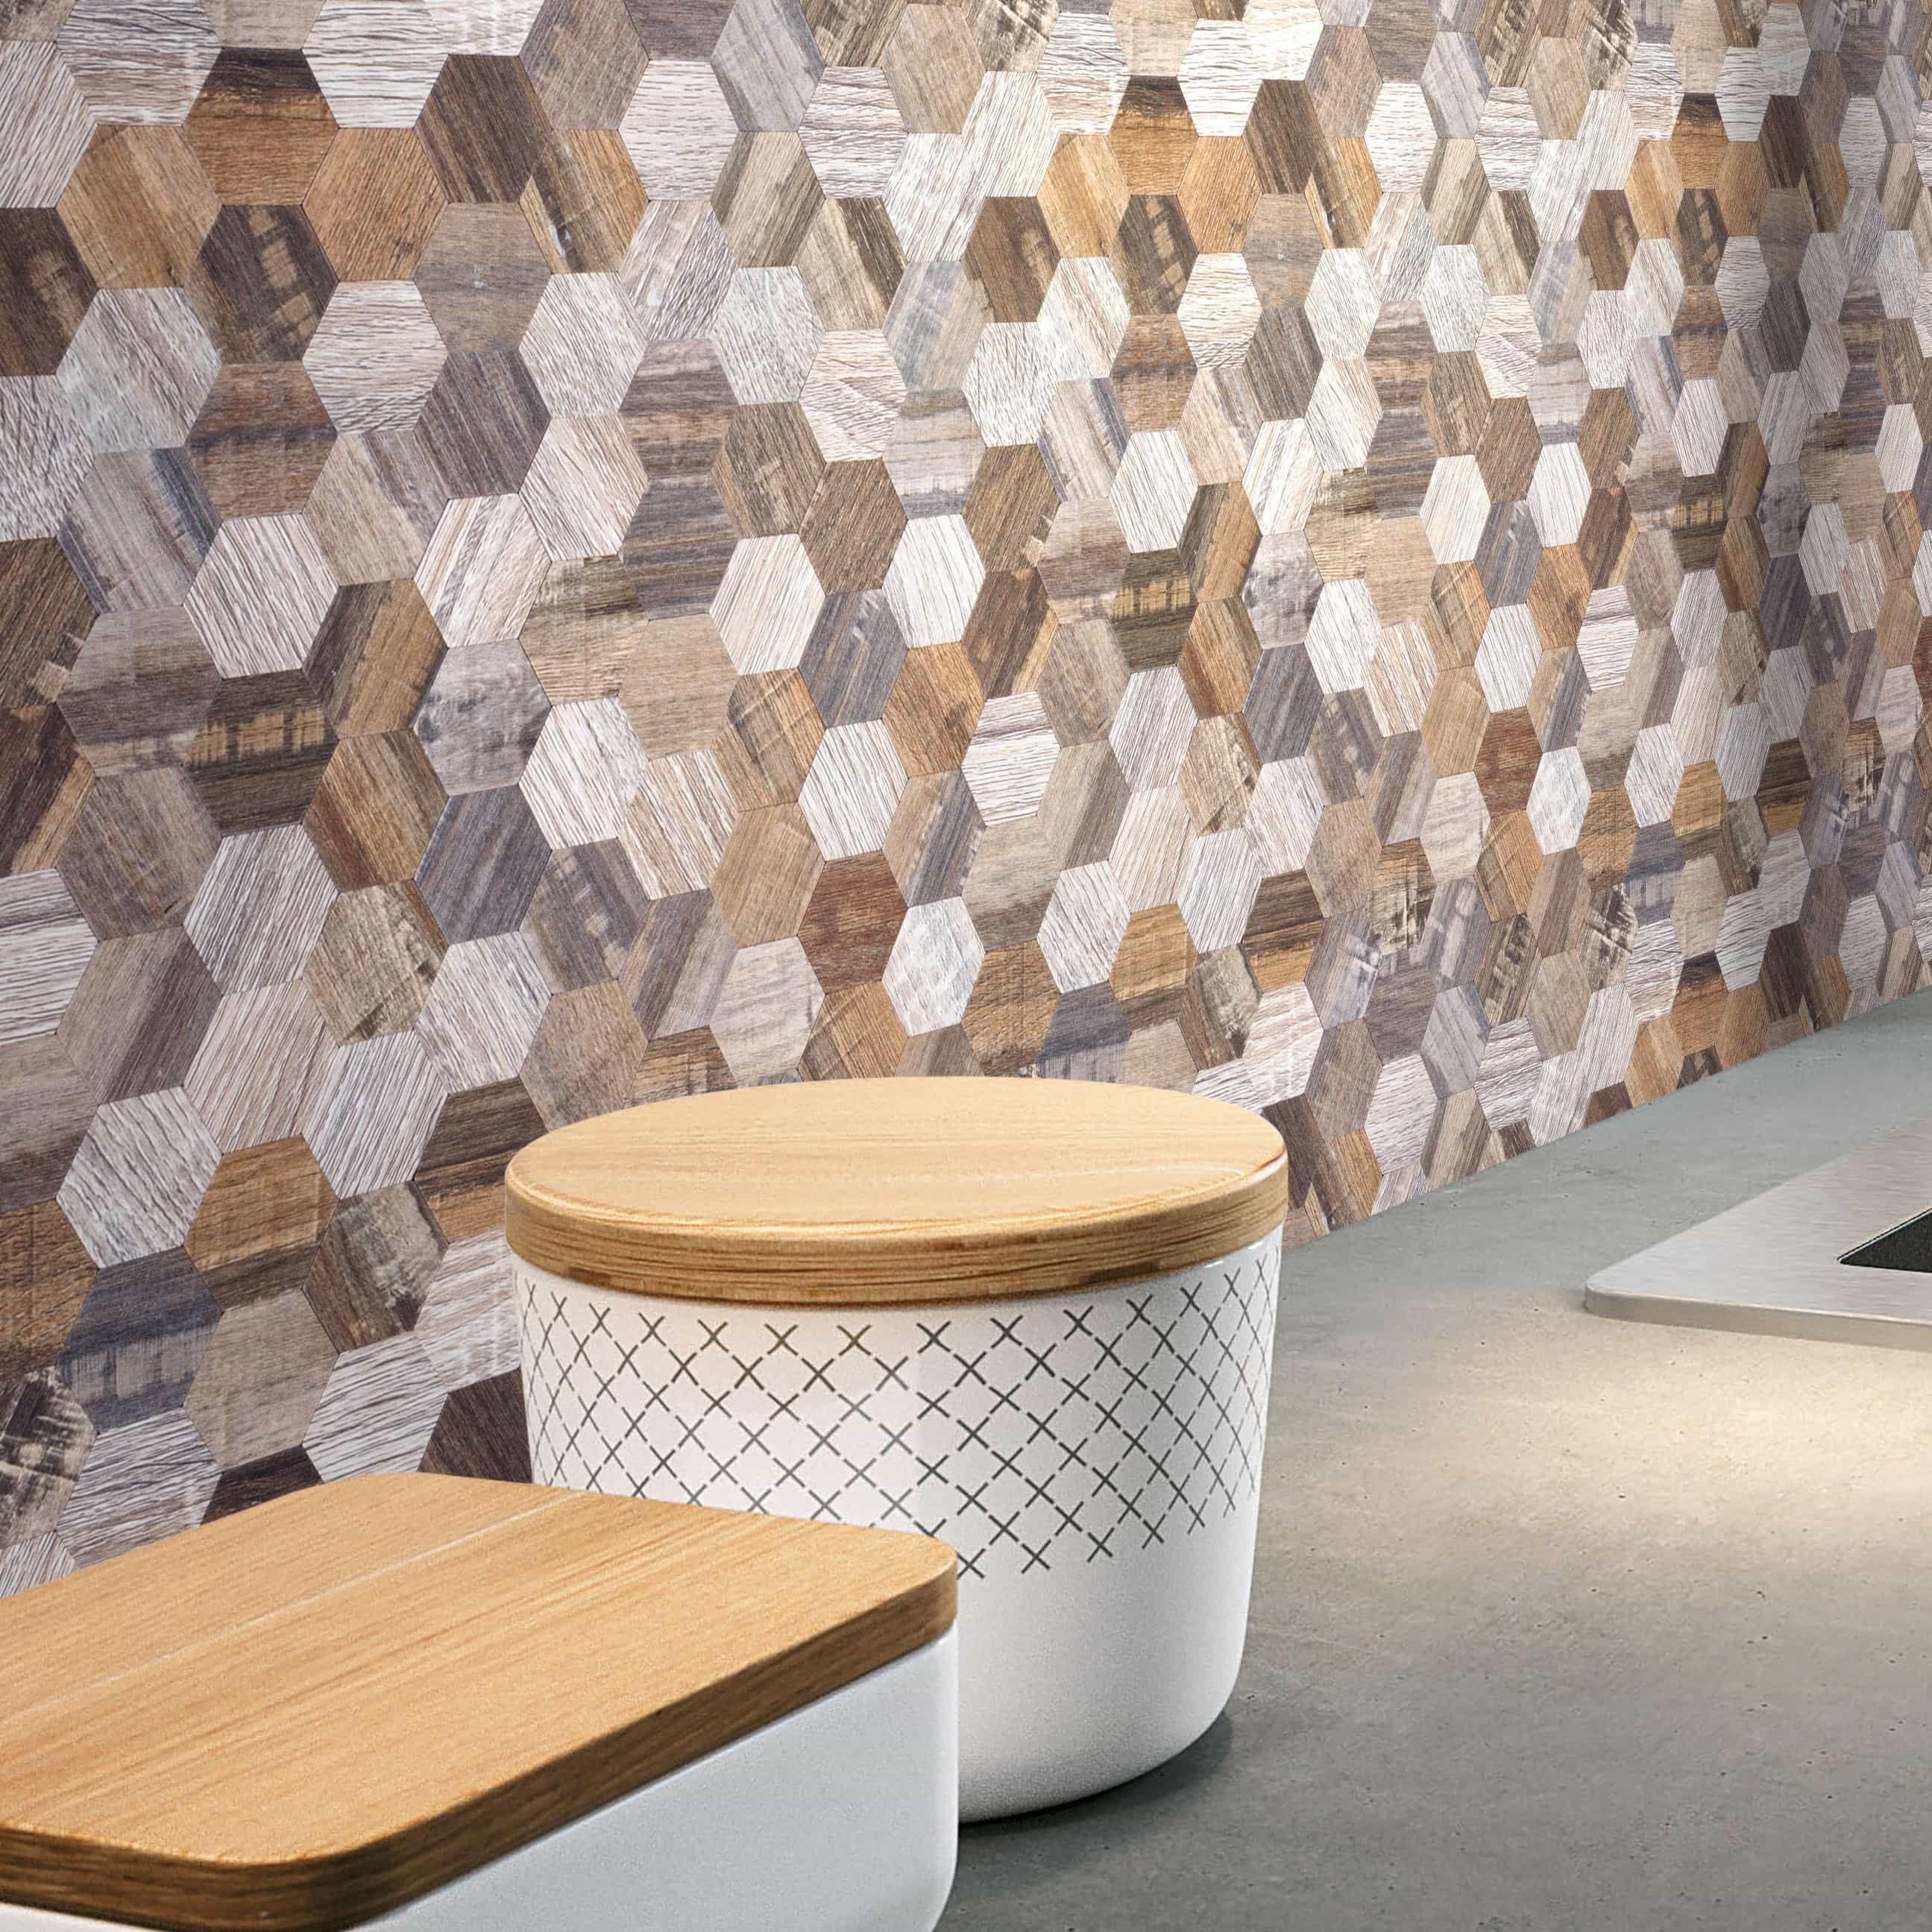 Peel And Stick Wood Wall Tiles Ideas To Create A: Modern Wood Look Hexagon DIY Peel-n-Stick Wall Tile